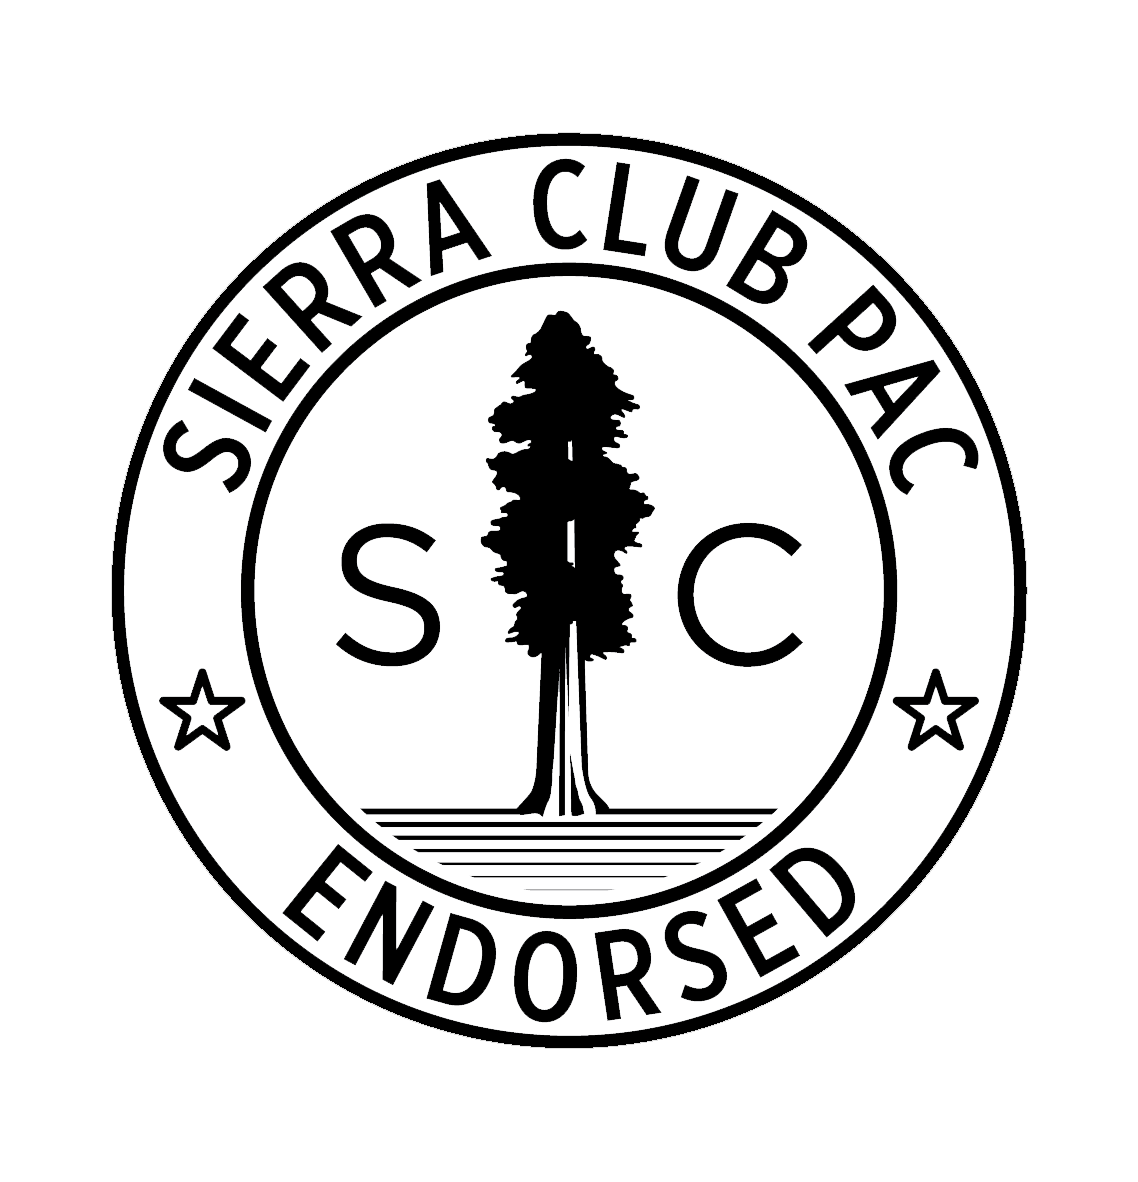 SierraClub-PAC-Endorsed-Logo-official.png